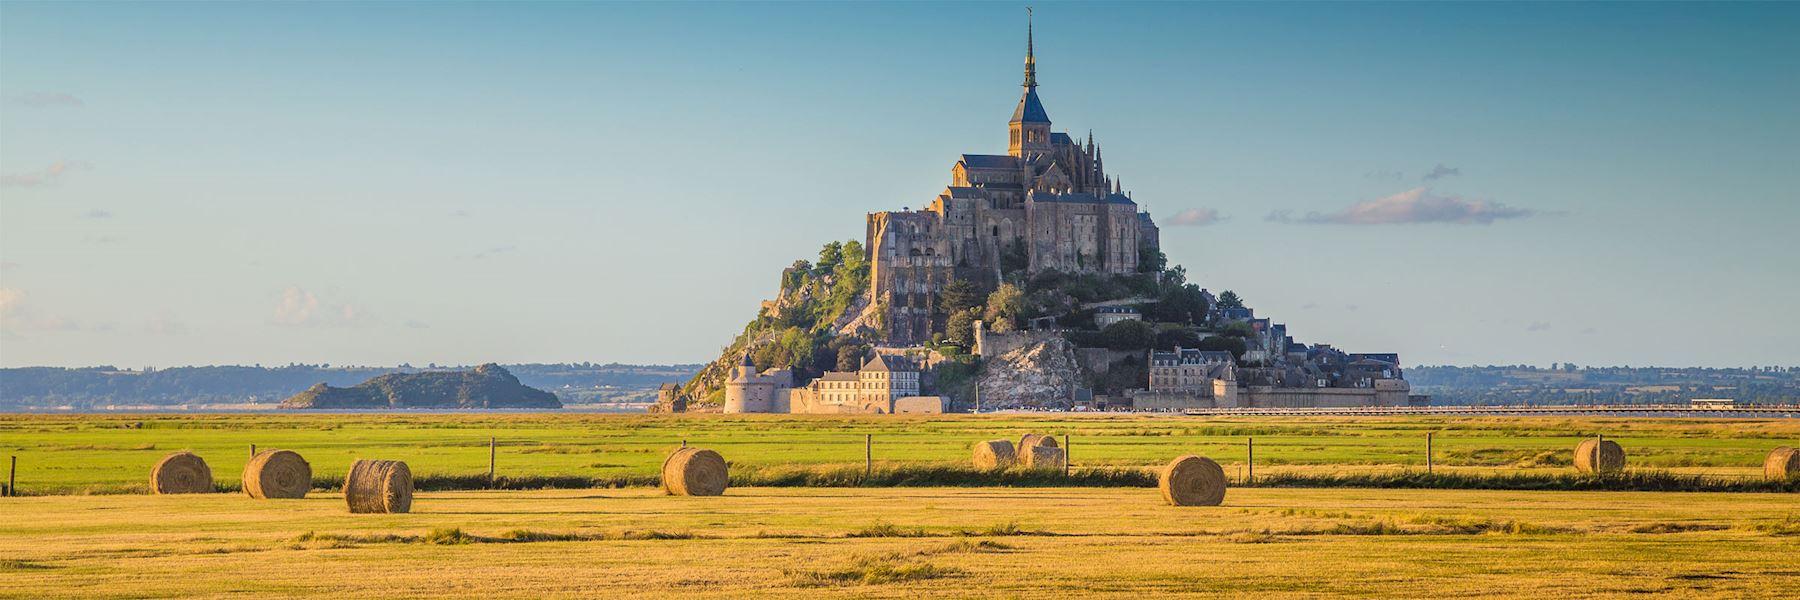 France trip ideas